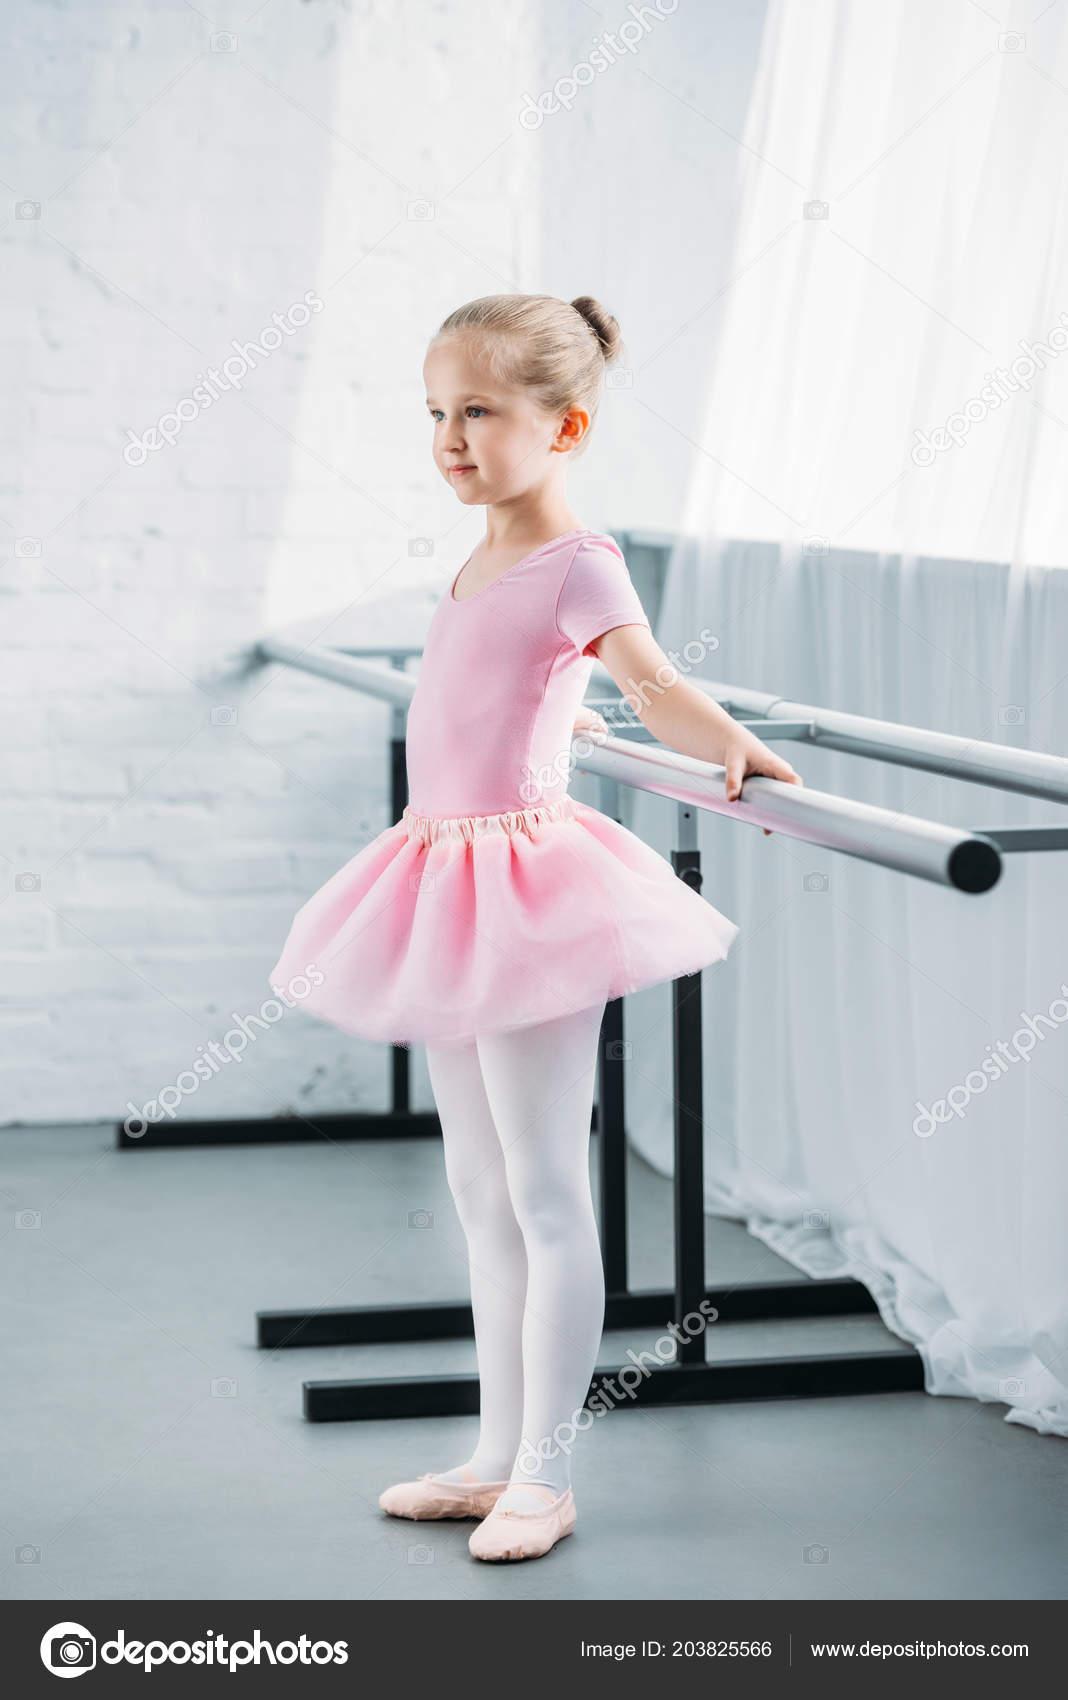 f3da2619737 Μερική Άποψη Του Παιδί Στο Ροζ Τουτού Εξάσκηση Μπαλέτο Και — Φωτογραφία  Αρχείου